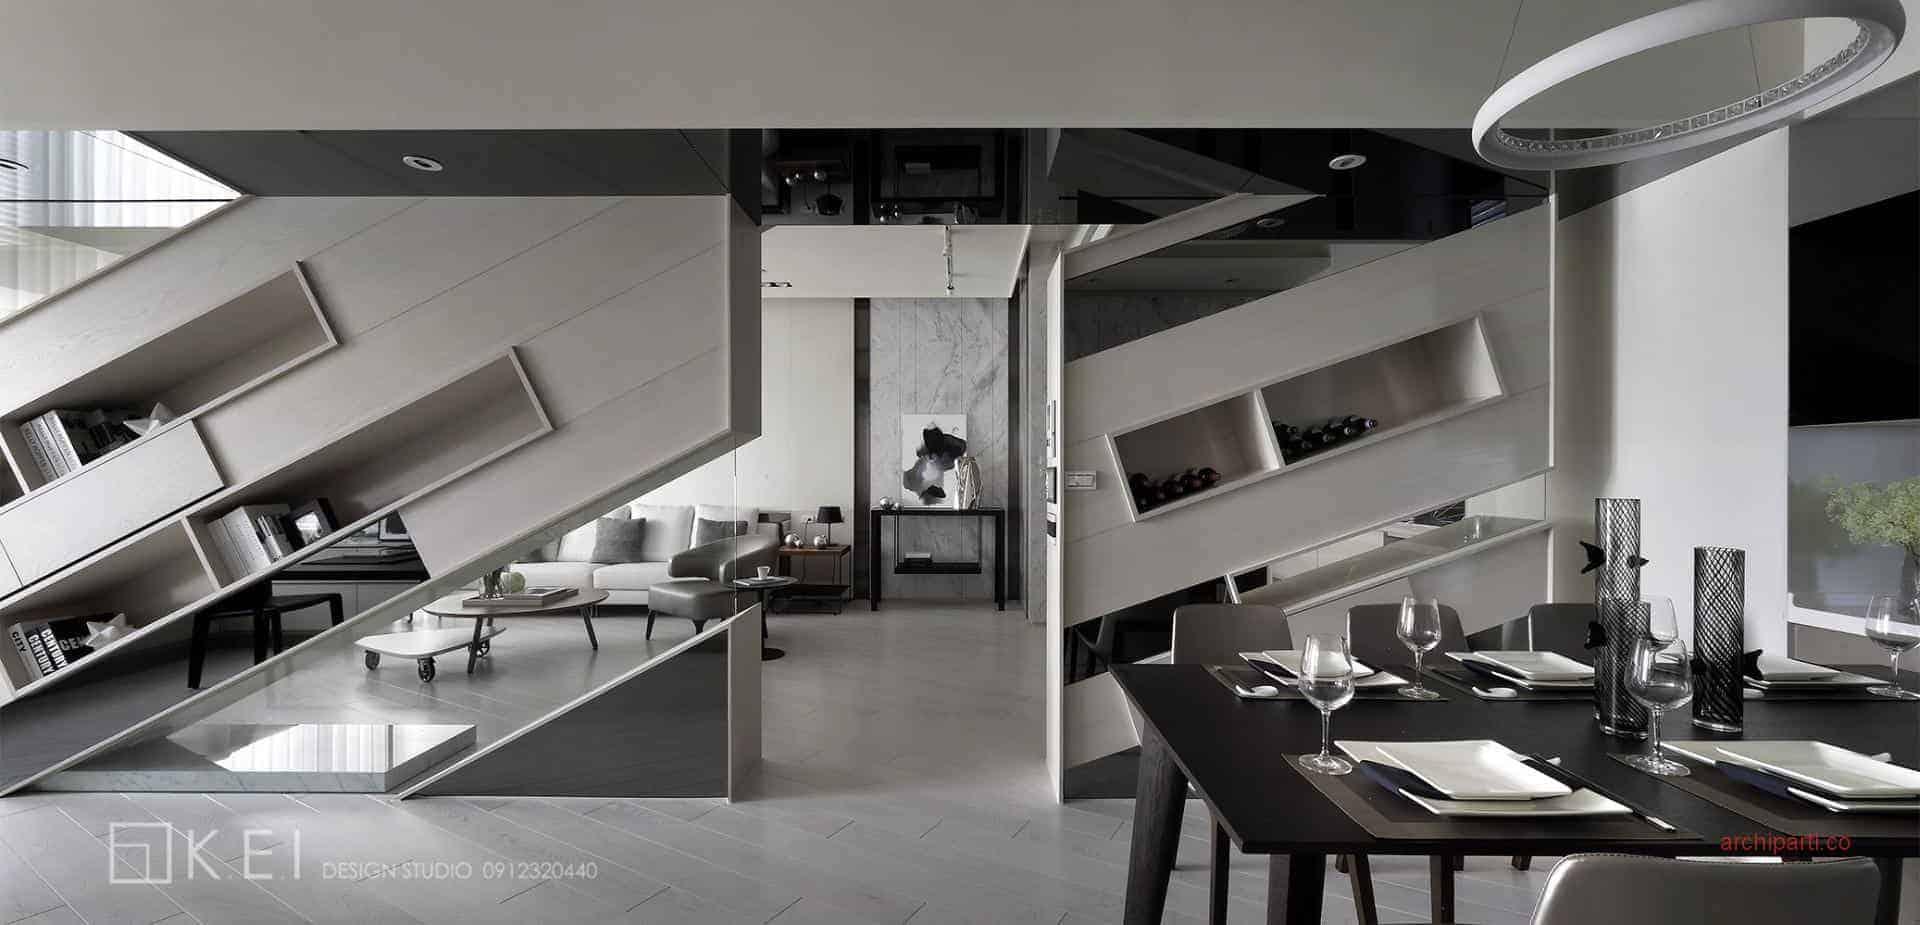 kitchen builder app best floor for 中西双厨 最厉害的现代厨房设计装修 你知道这23个秘密吗 现代厨房设计图